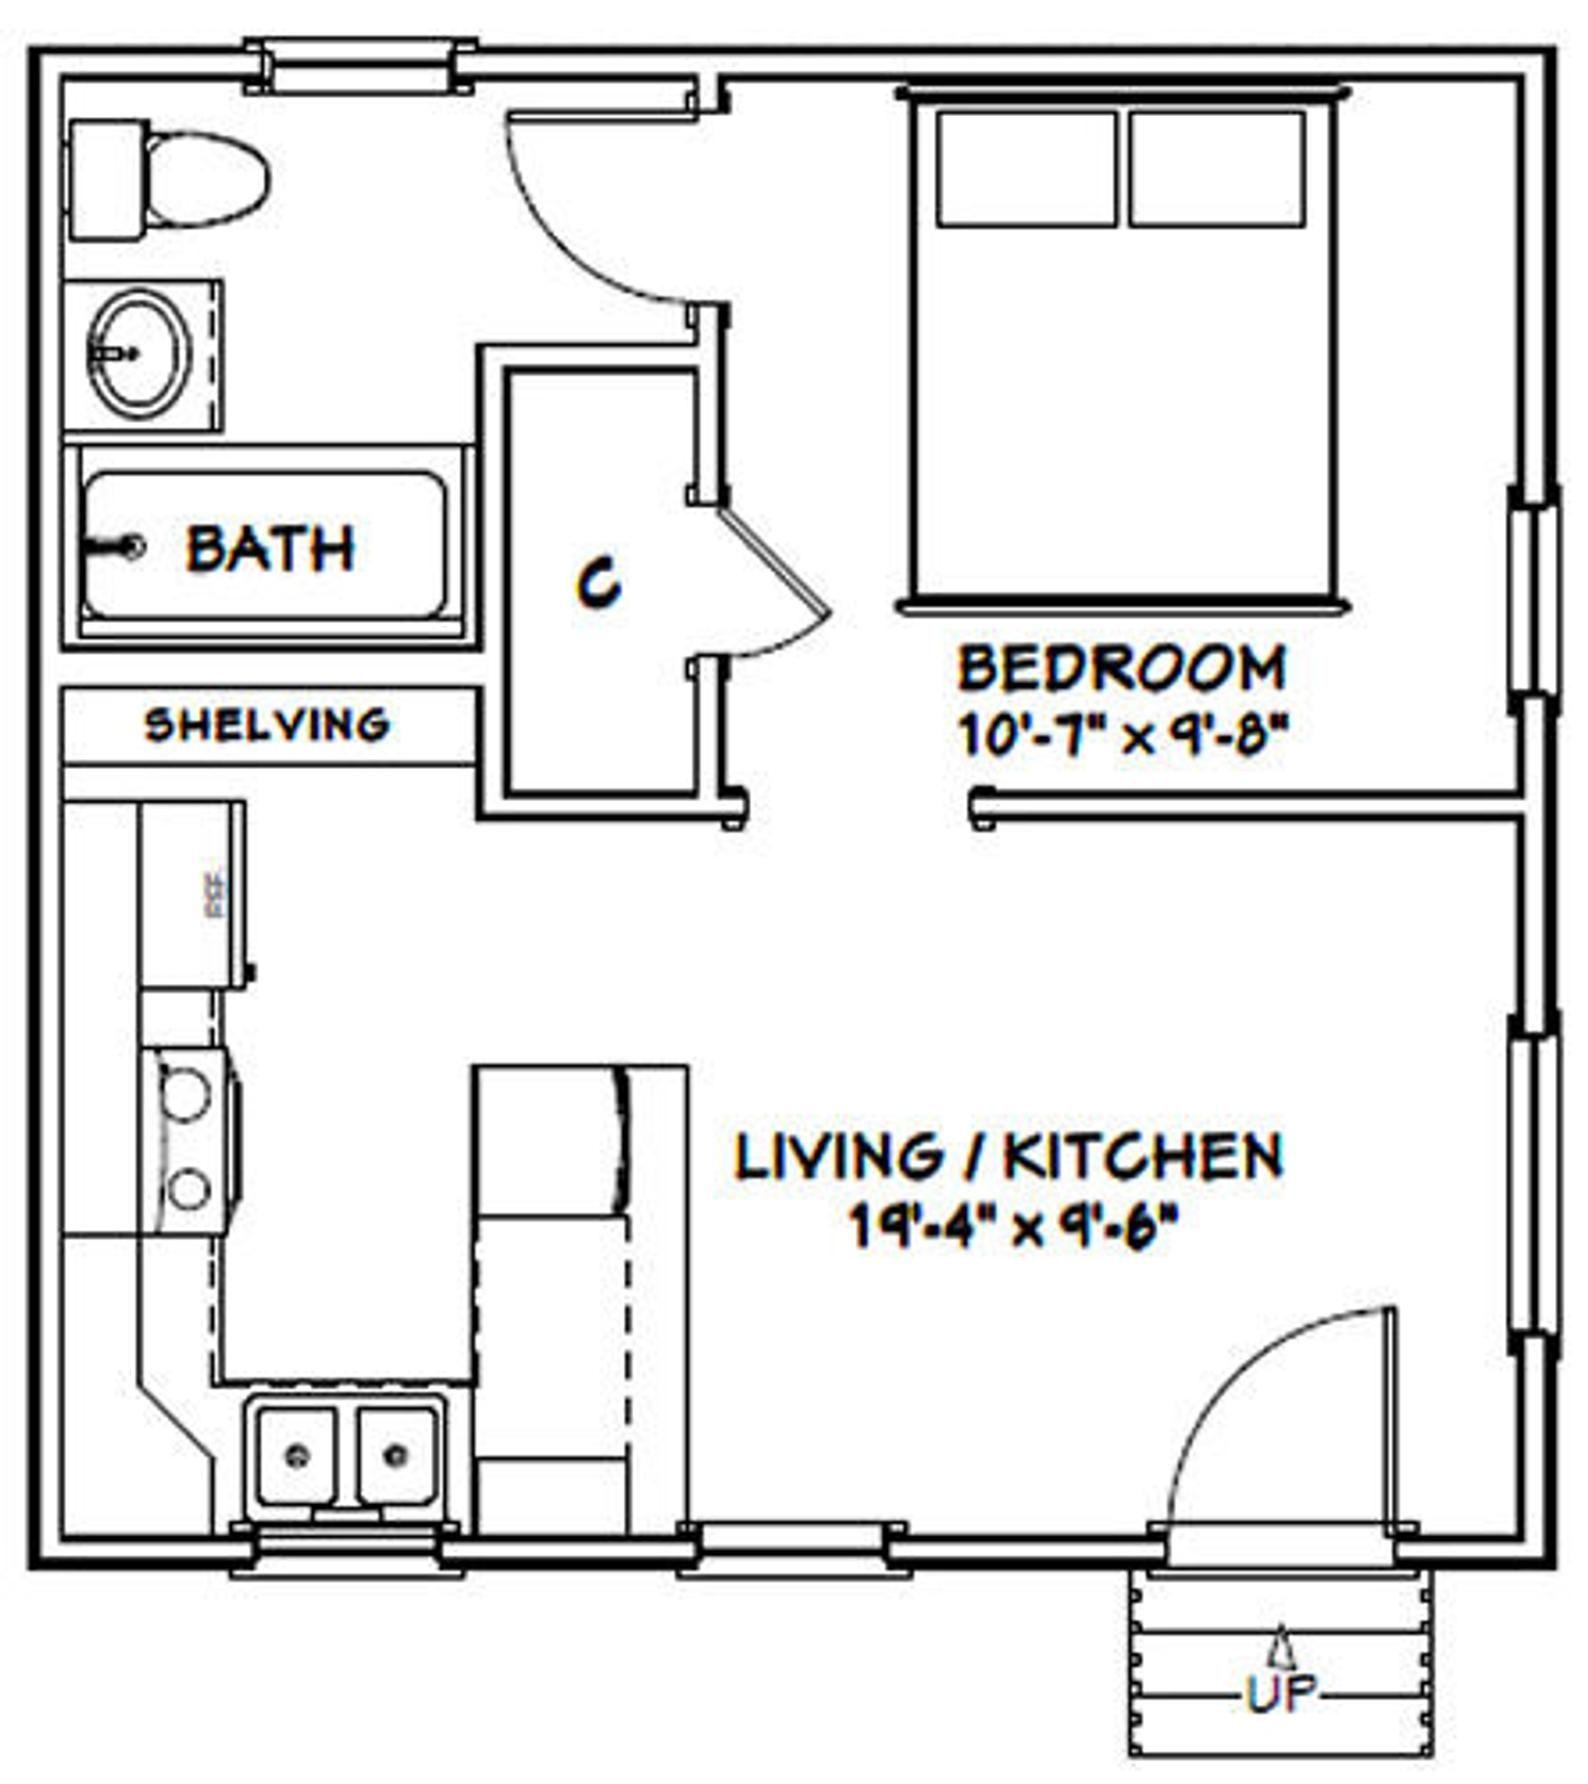 11+ 20 x 20 house floor plans image popular